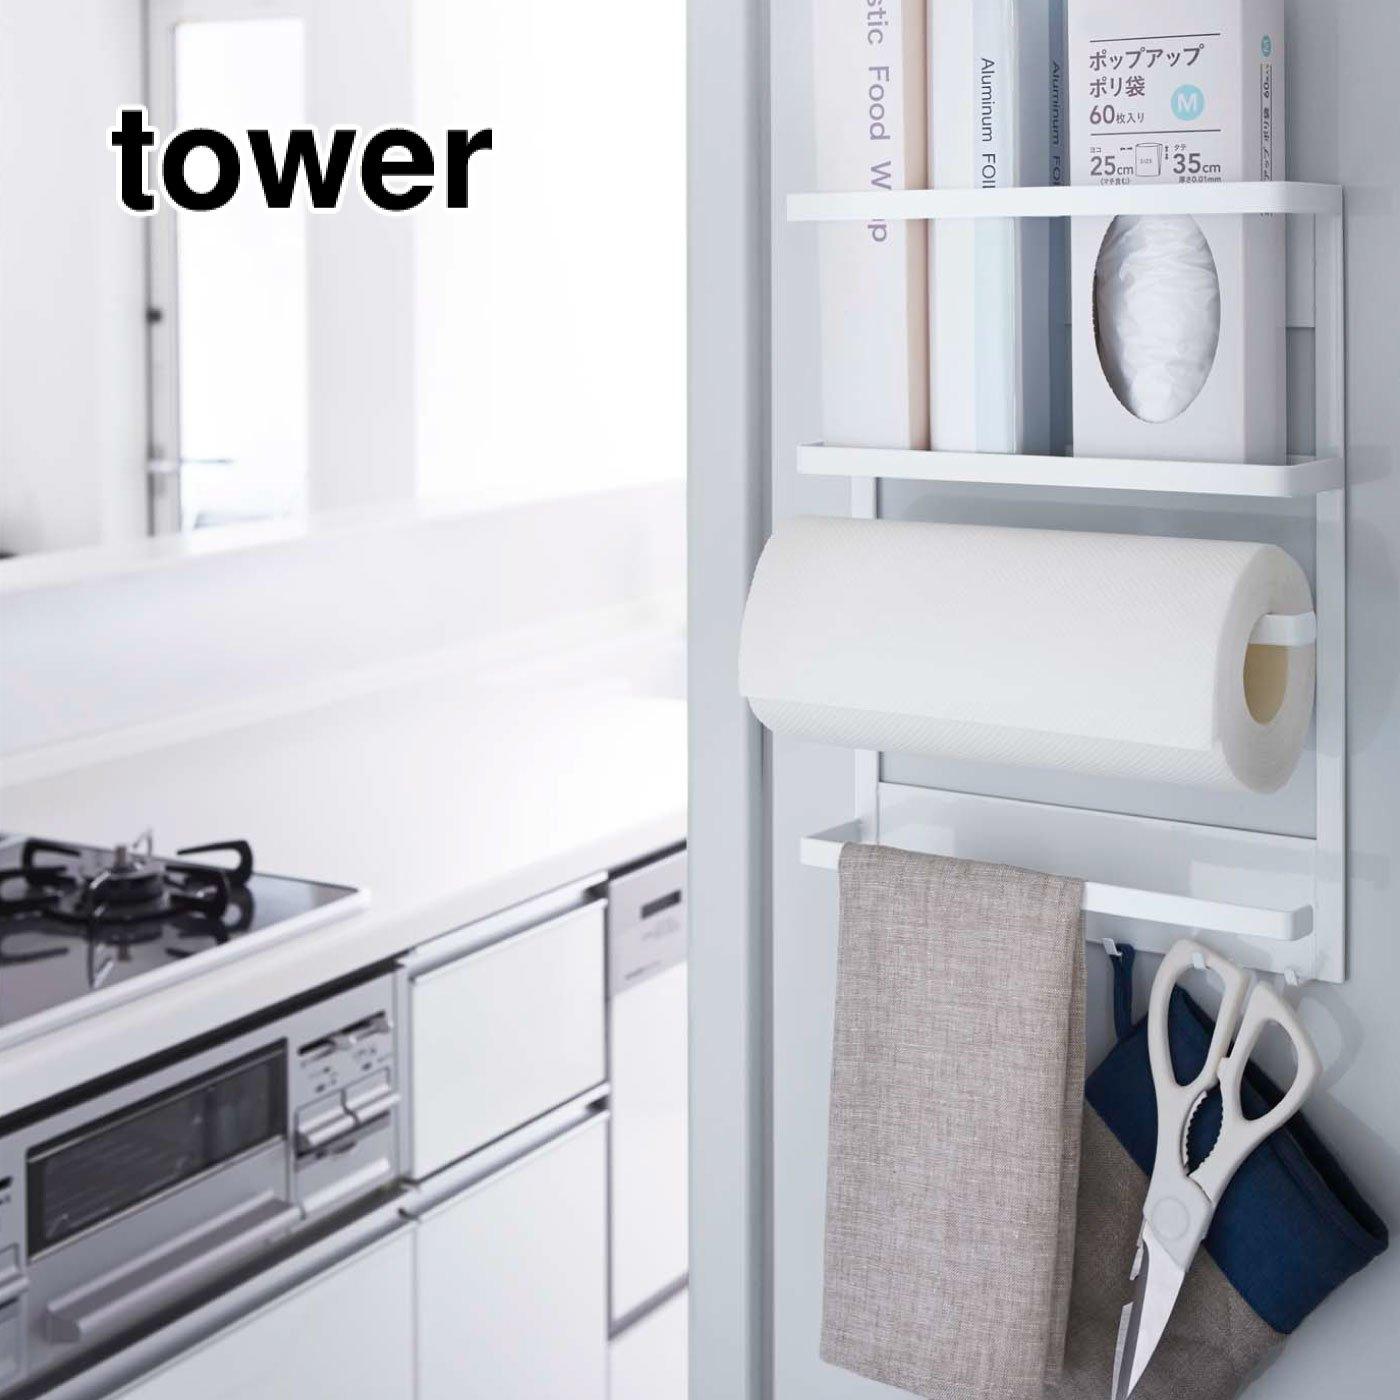 tower マグネット冷蔵庫サイドラック